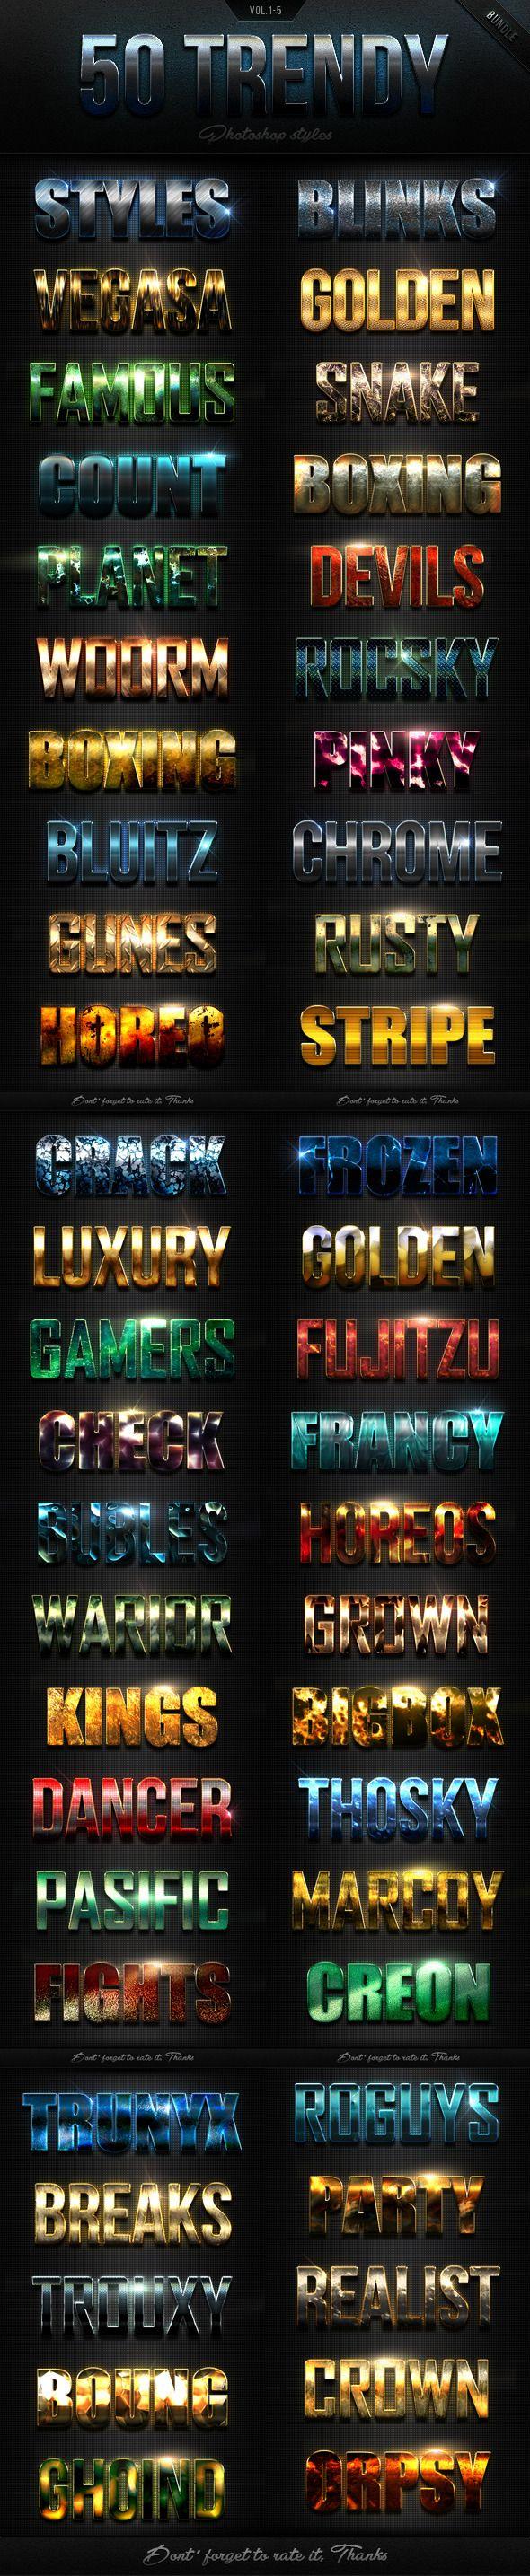 50 Trendy Photoshop Styles Bundle (CS, all, asl, bundle, effects, flares, font, light, metal, mixed, modern, pack, photoshop, premium, professional, styles, text, texture)